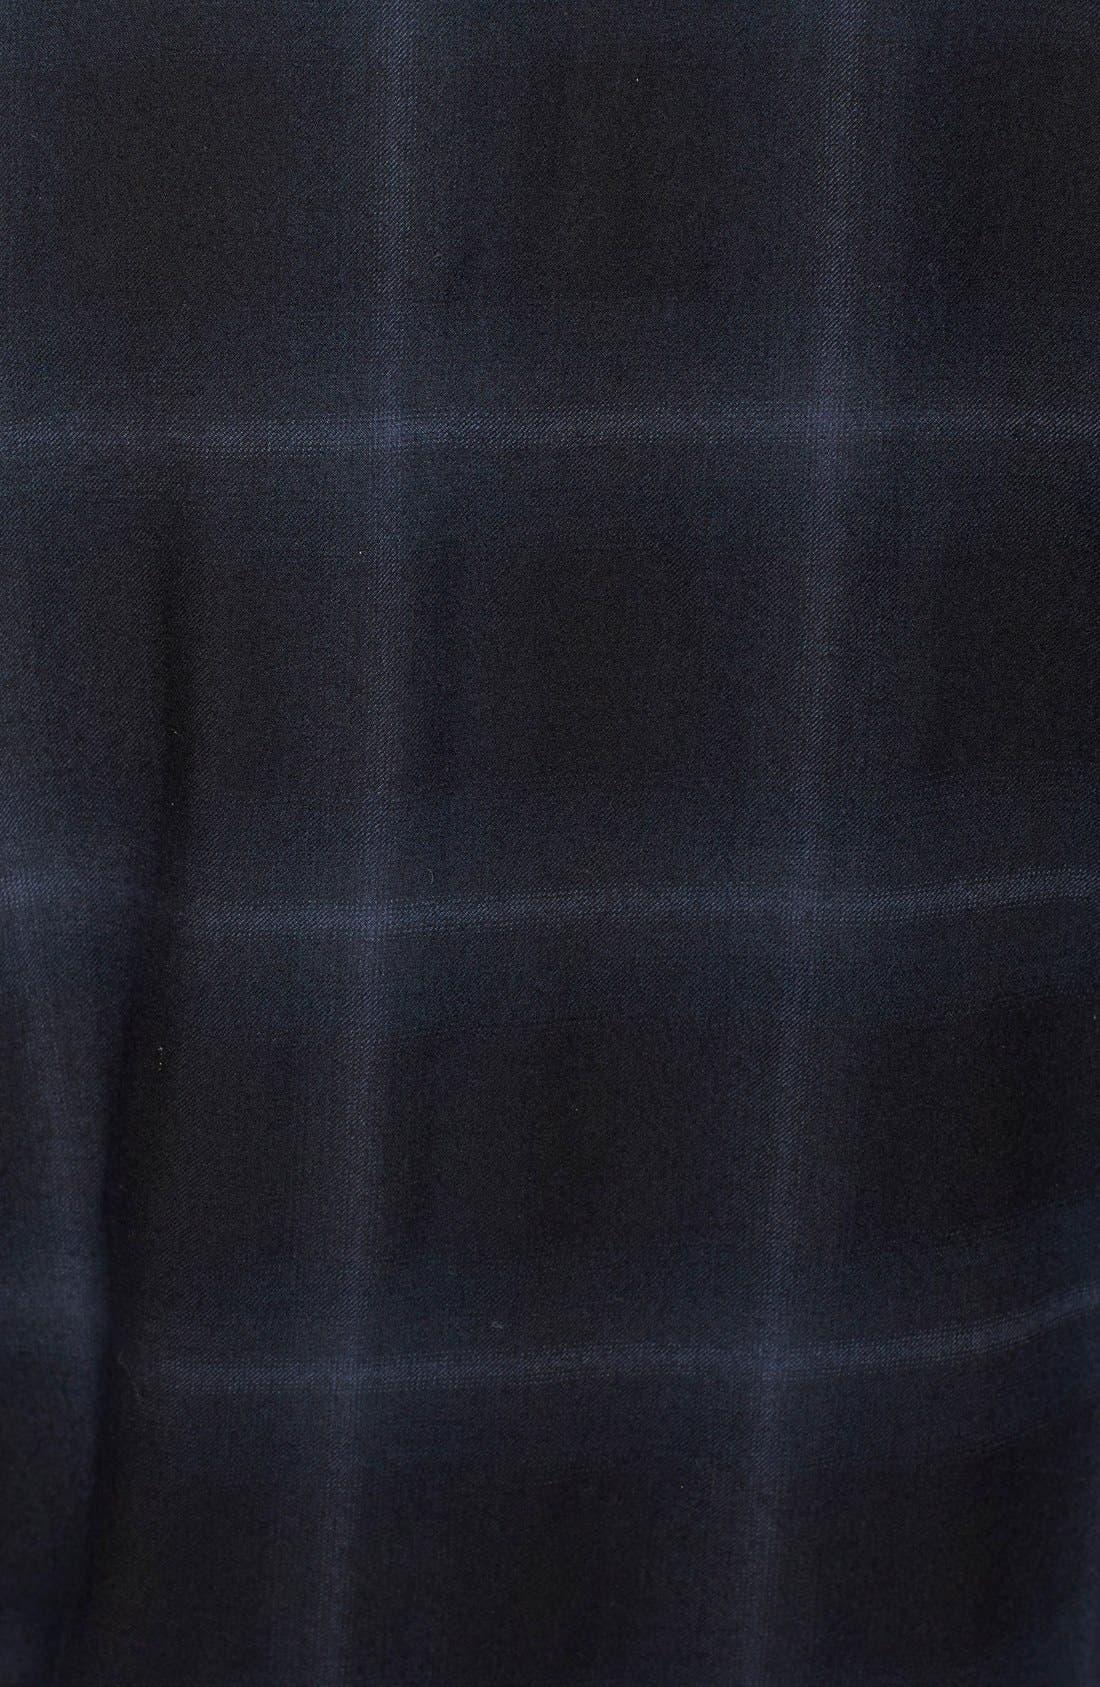 Alternate Image 3  - Helmut Lang Plaid Wool & Cashmere Flannel Shirt